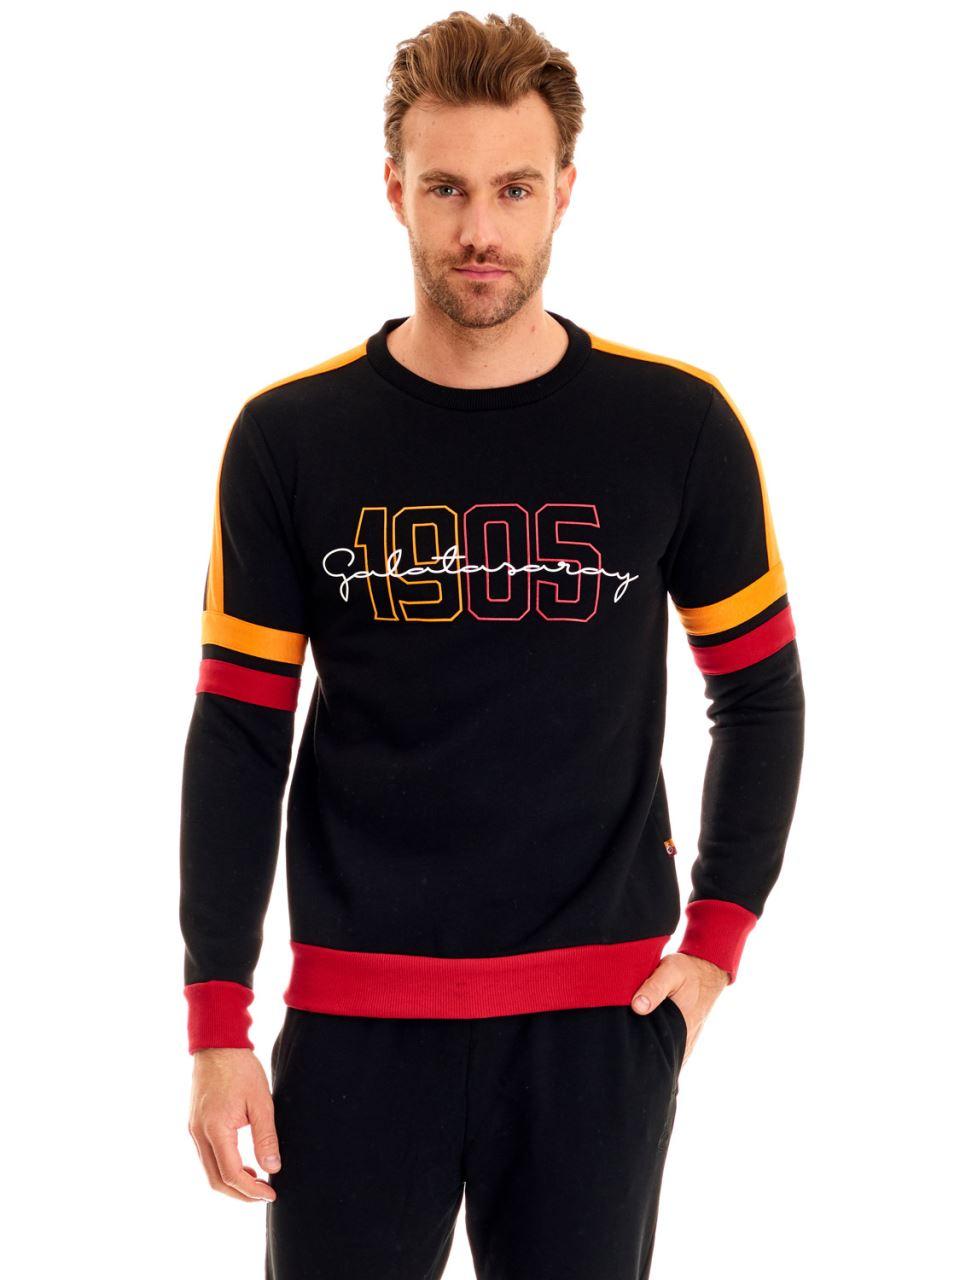 Galatasaray 1905 Erkek Sweatshirt E192095